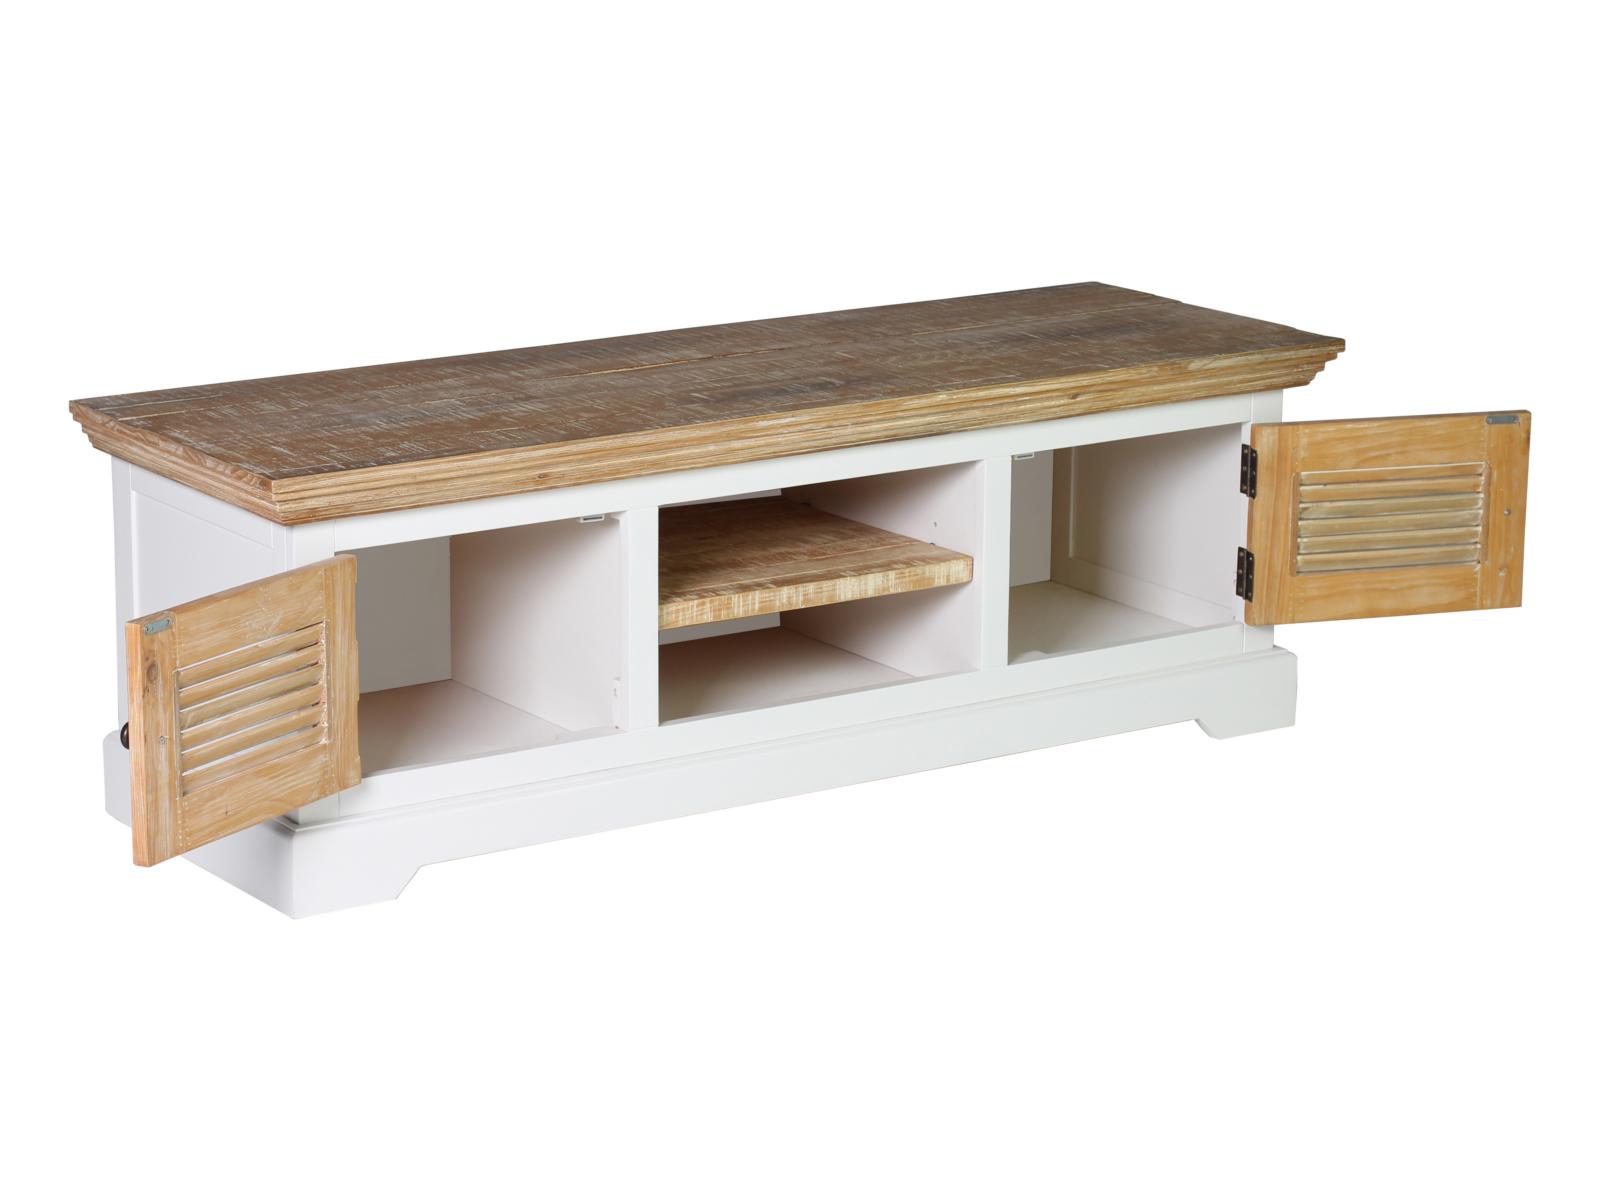 tv bank manila 150x50 wei echt holz pinie lowboard tv m bel wohnzimmerm bel. Black Bedroom Furniture Sets. Home Design Ideas